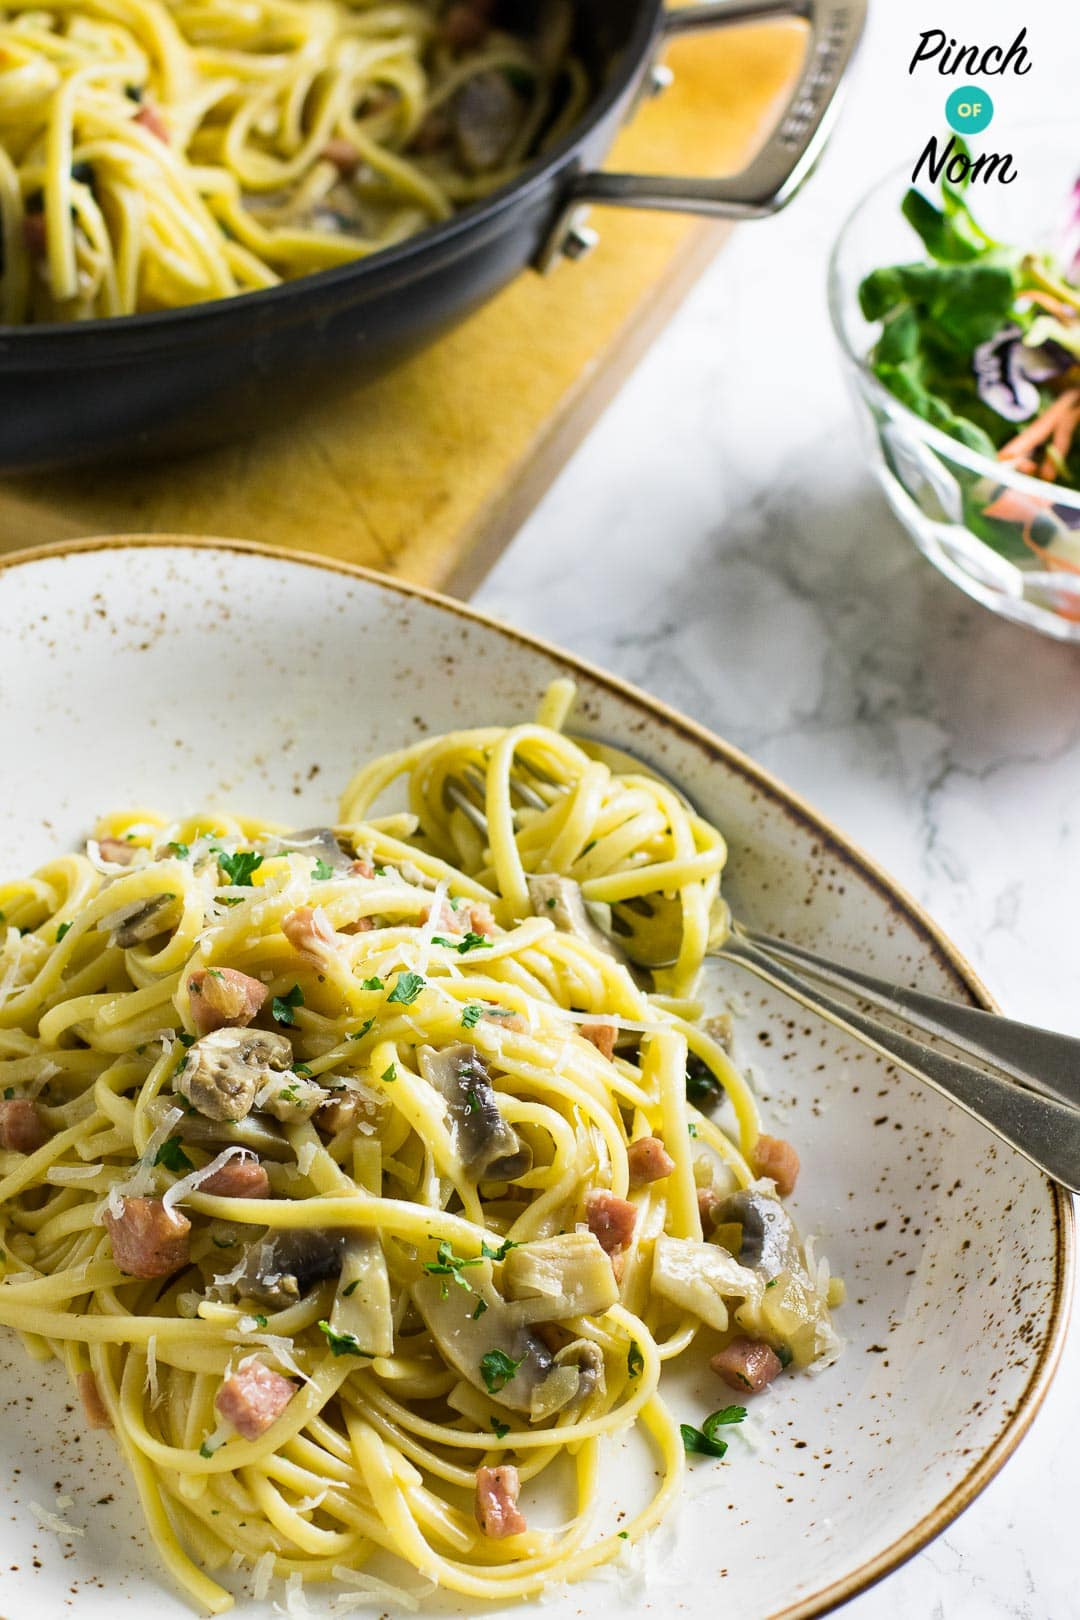 Spaghetti Carbonara Slimming World Weight Watchers Friendly